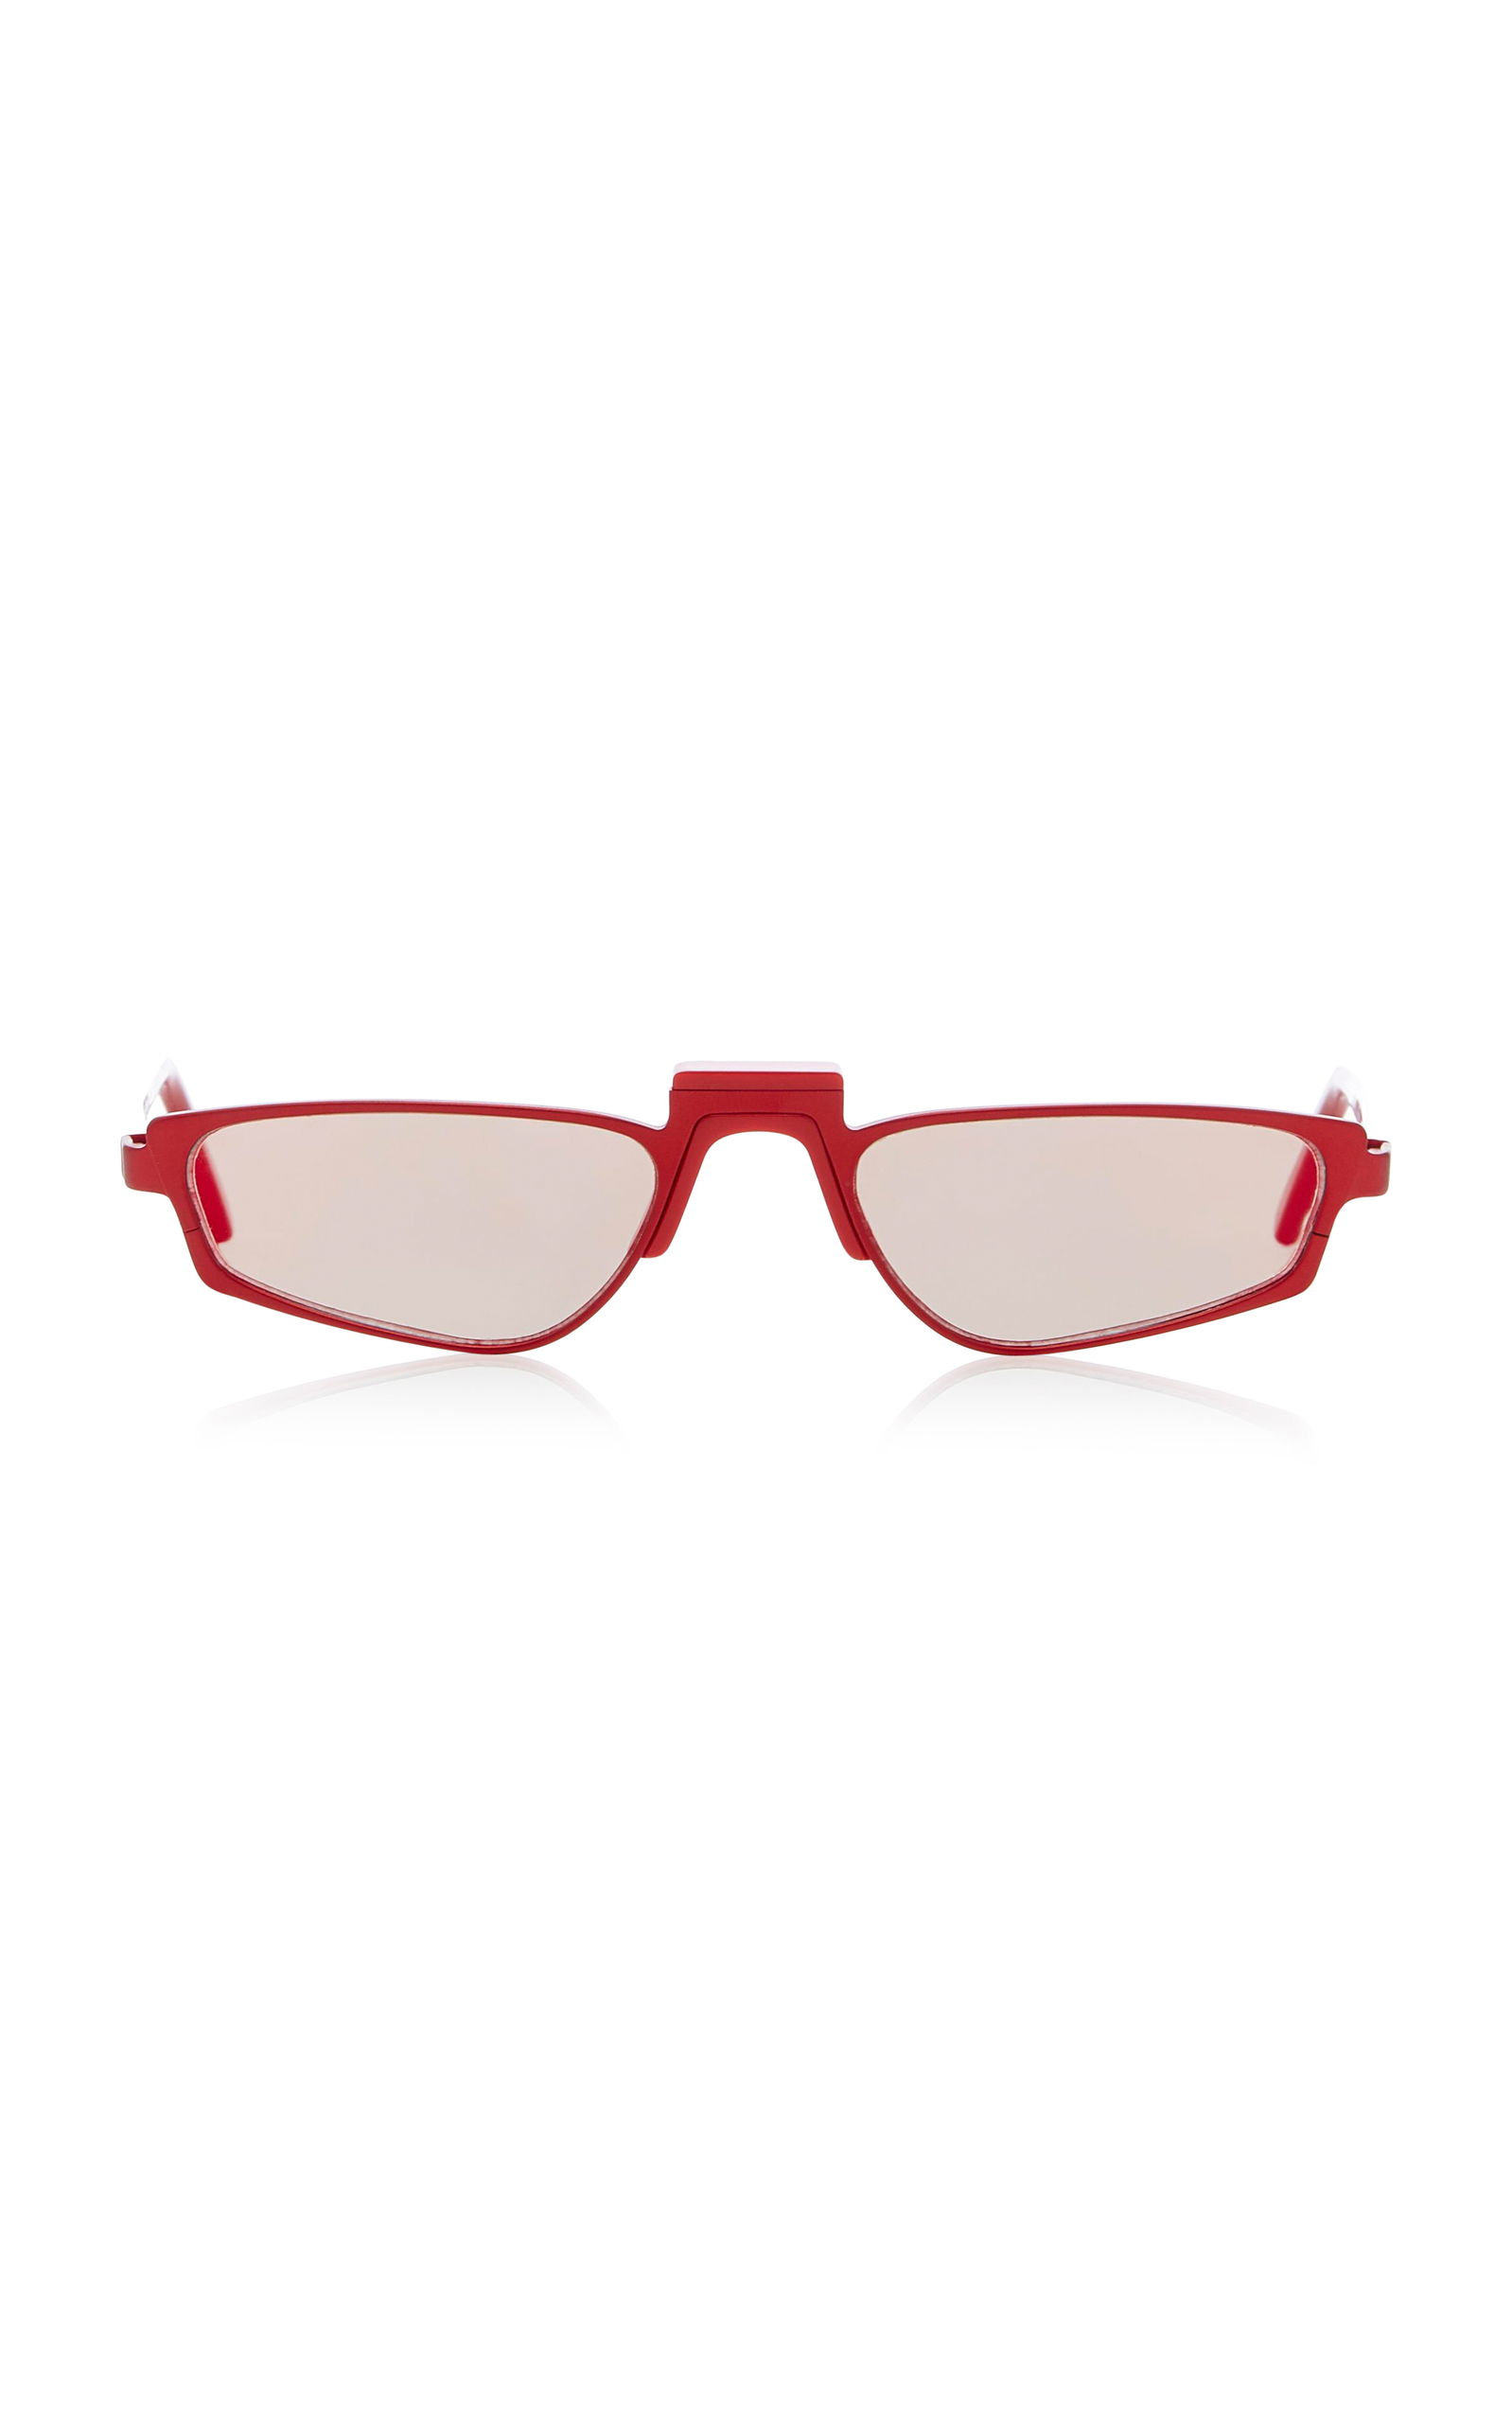 436215ebfa9 Women s Andy Wolf Eyewear